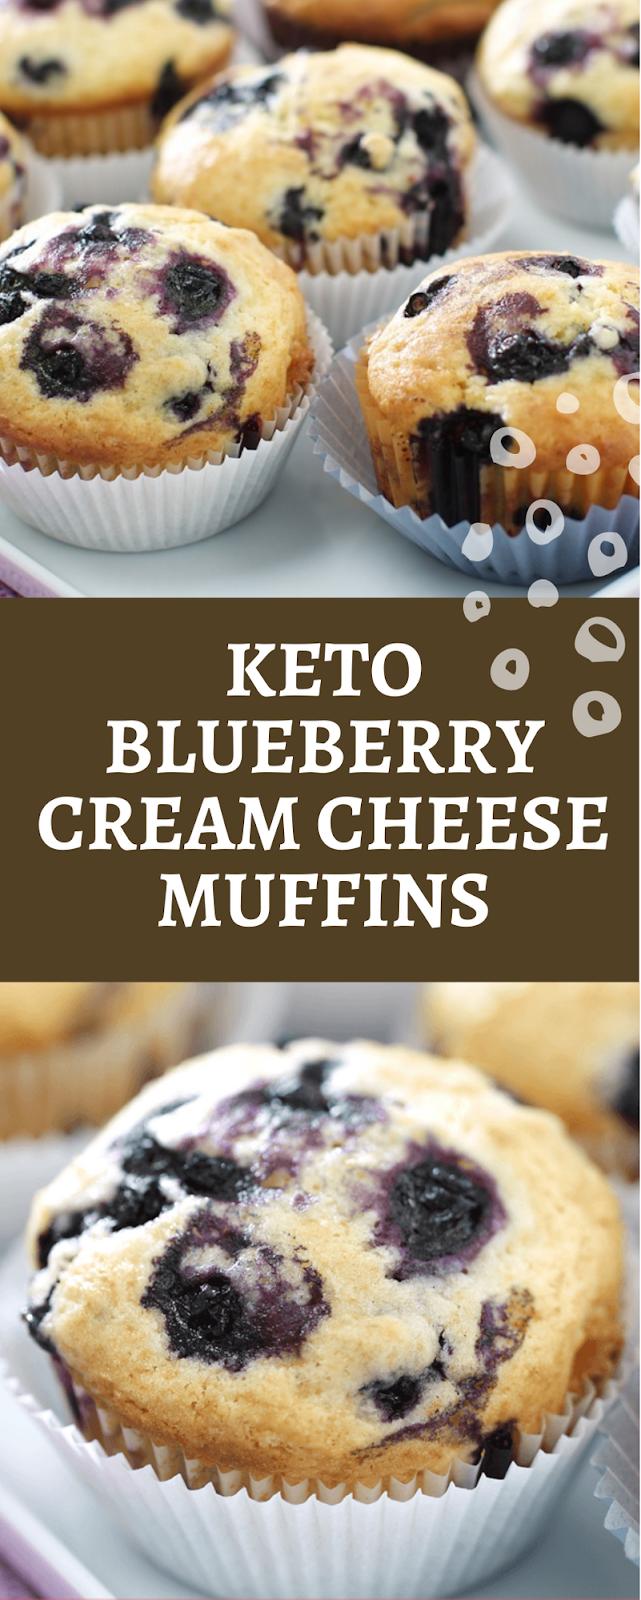 Keto Blueberry Cream Cheese Muffins - Skyla | Blueberry ...